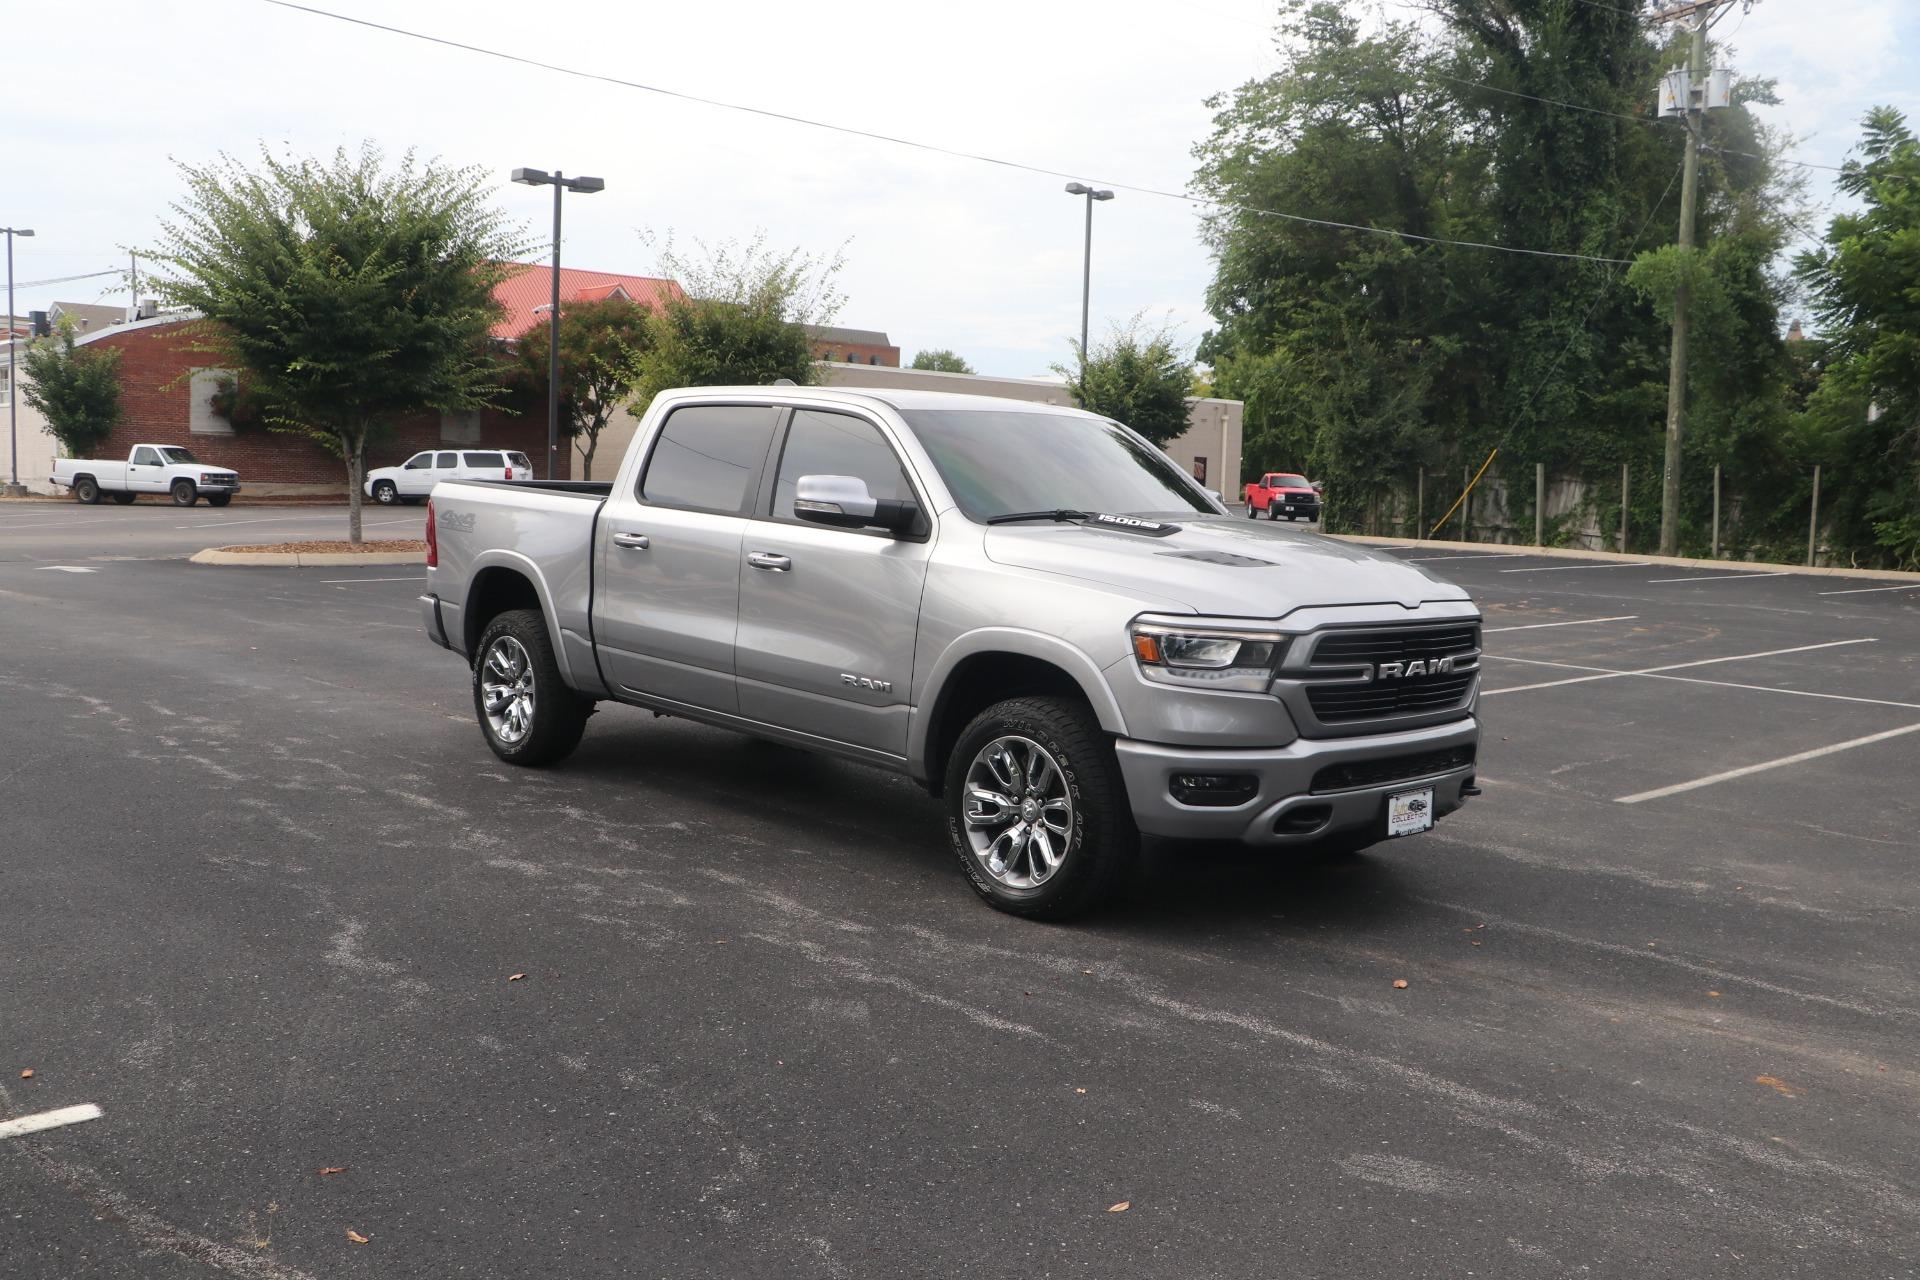 Used 2020 Ram Ram Pickup 1500 Laramie CREW CAB 4X4 W/SPT APP PKG for sale $53,950 at Auto Collection in Murfreesboro TN 37130 1